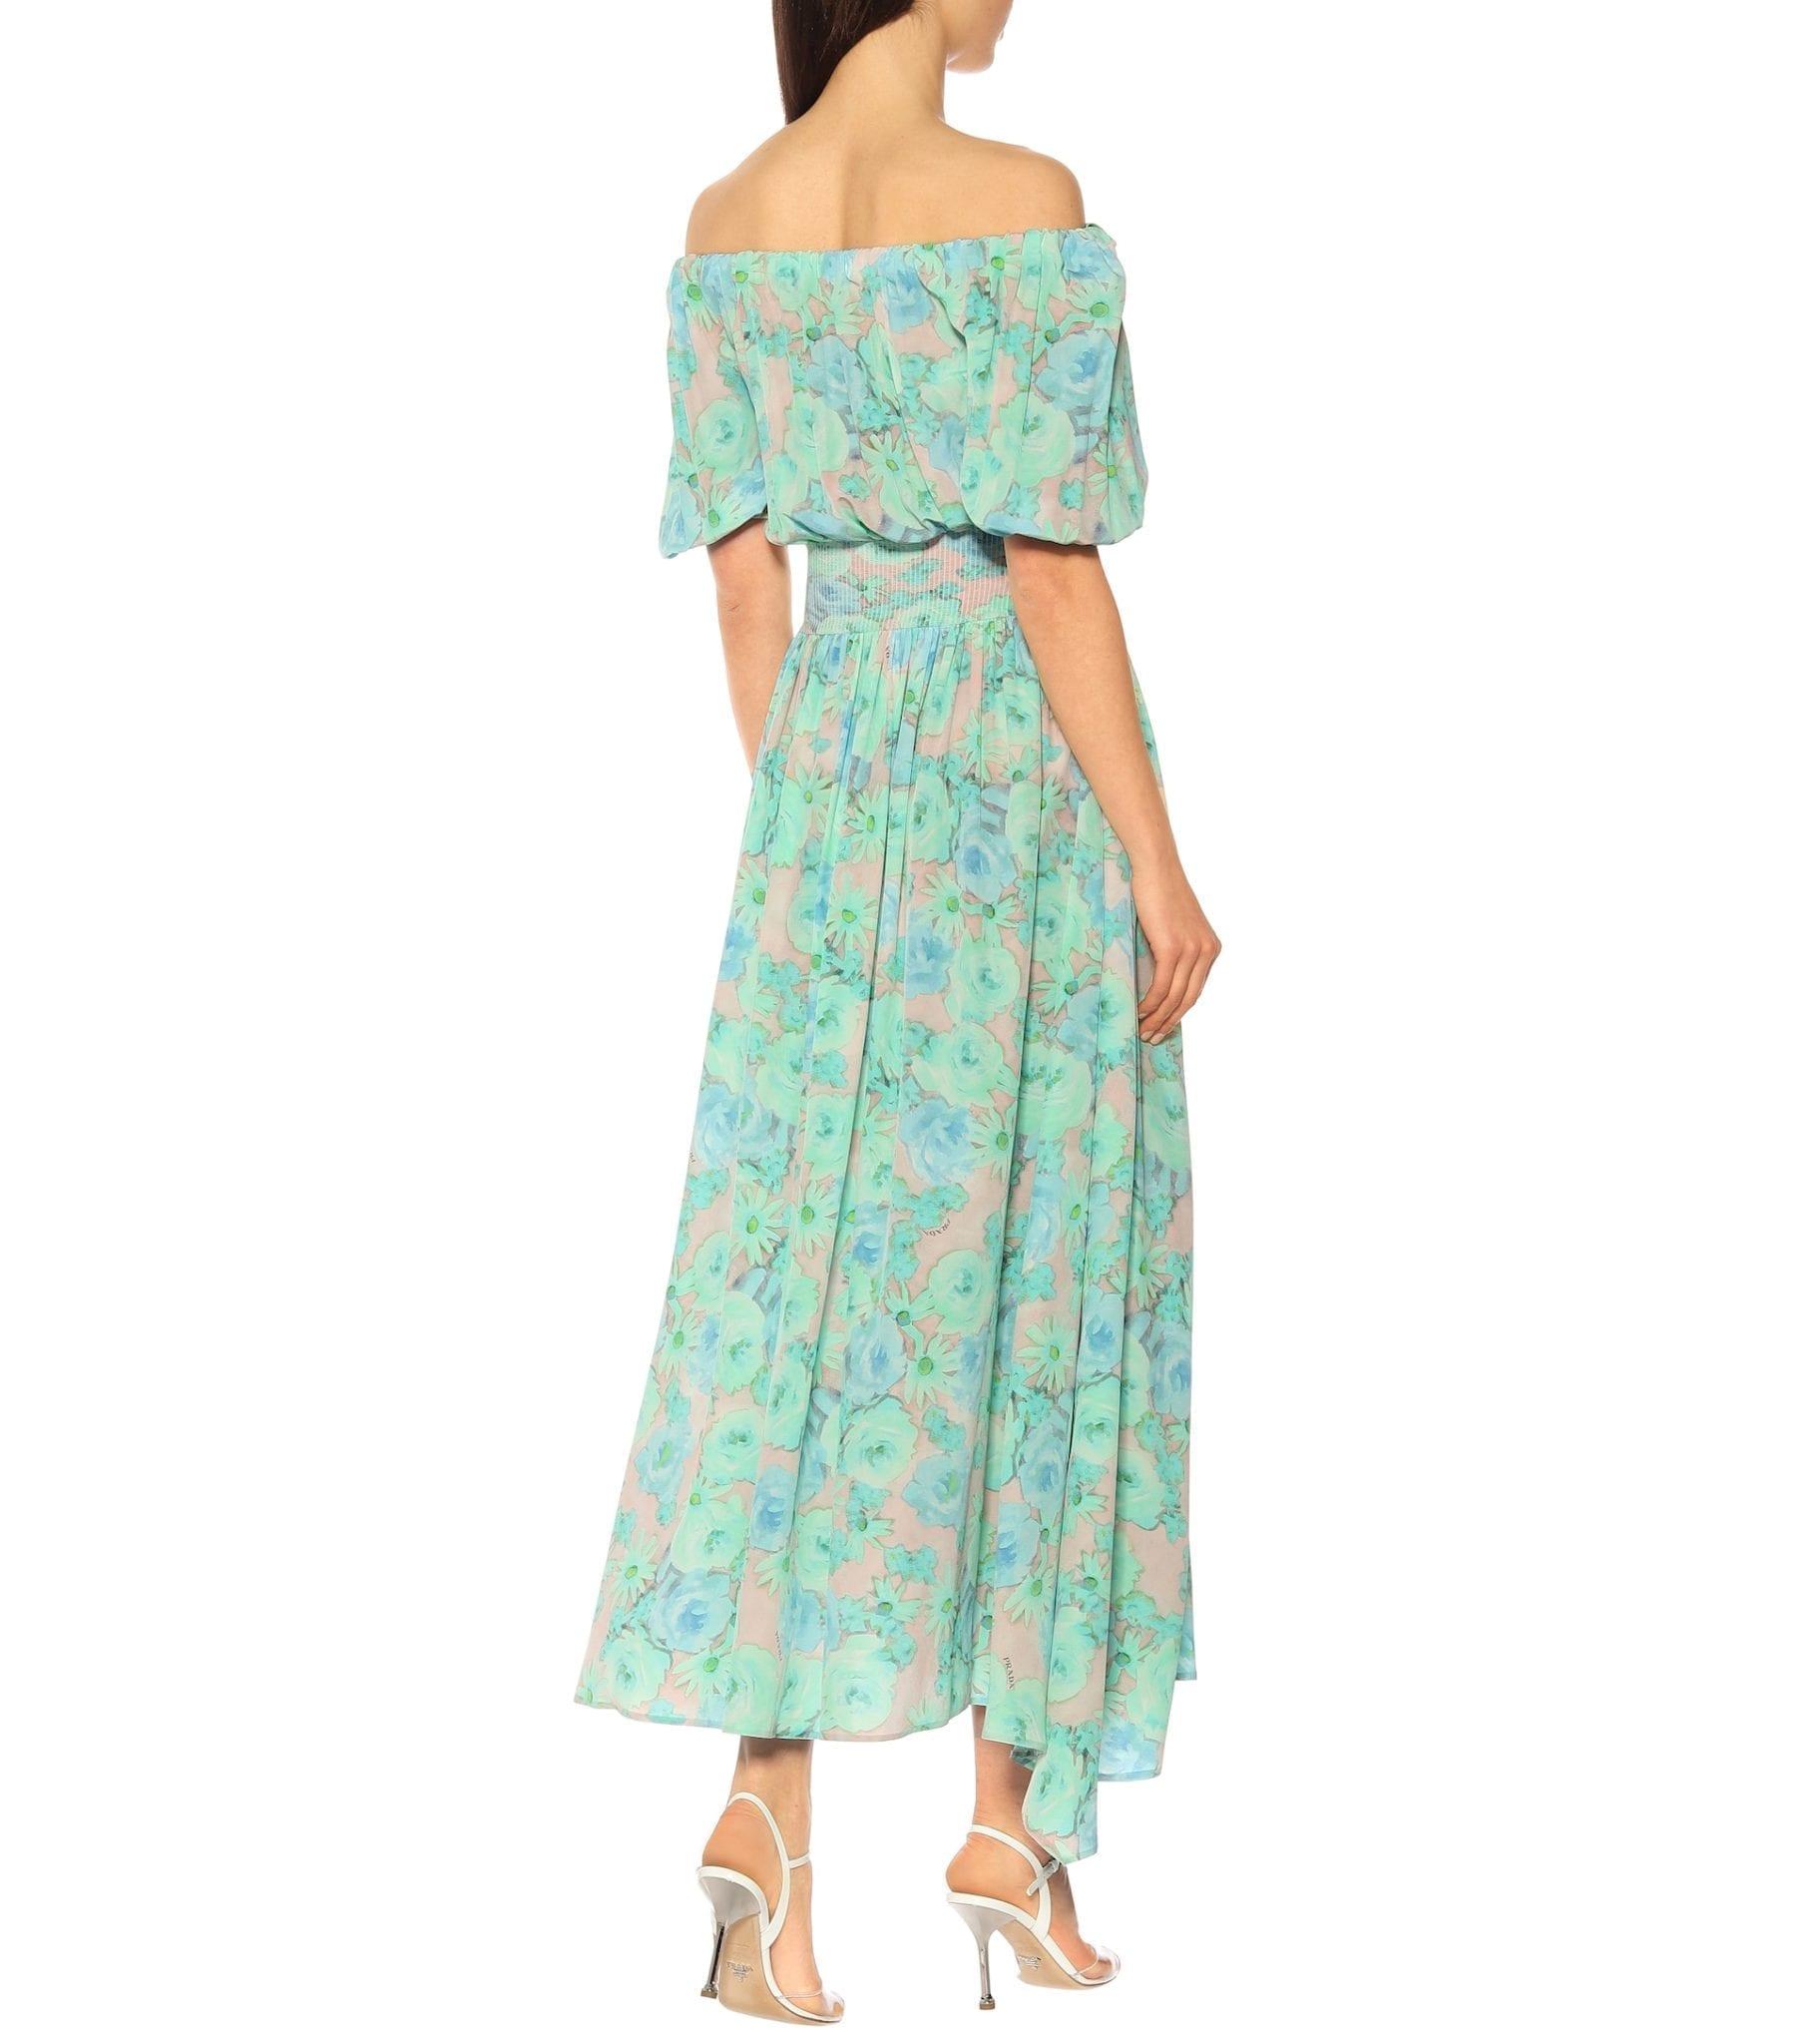 PRADA Floral Silk Midi Dress